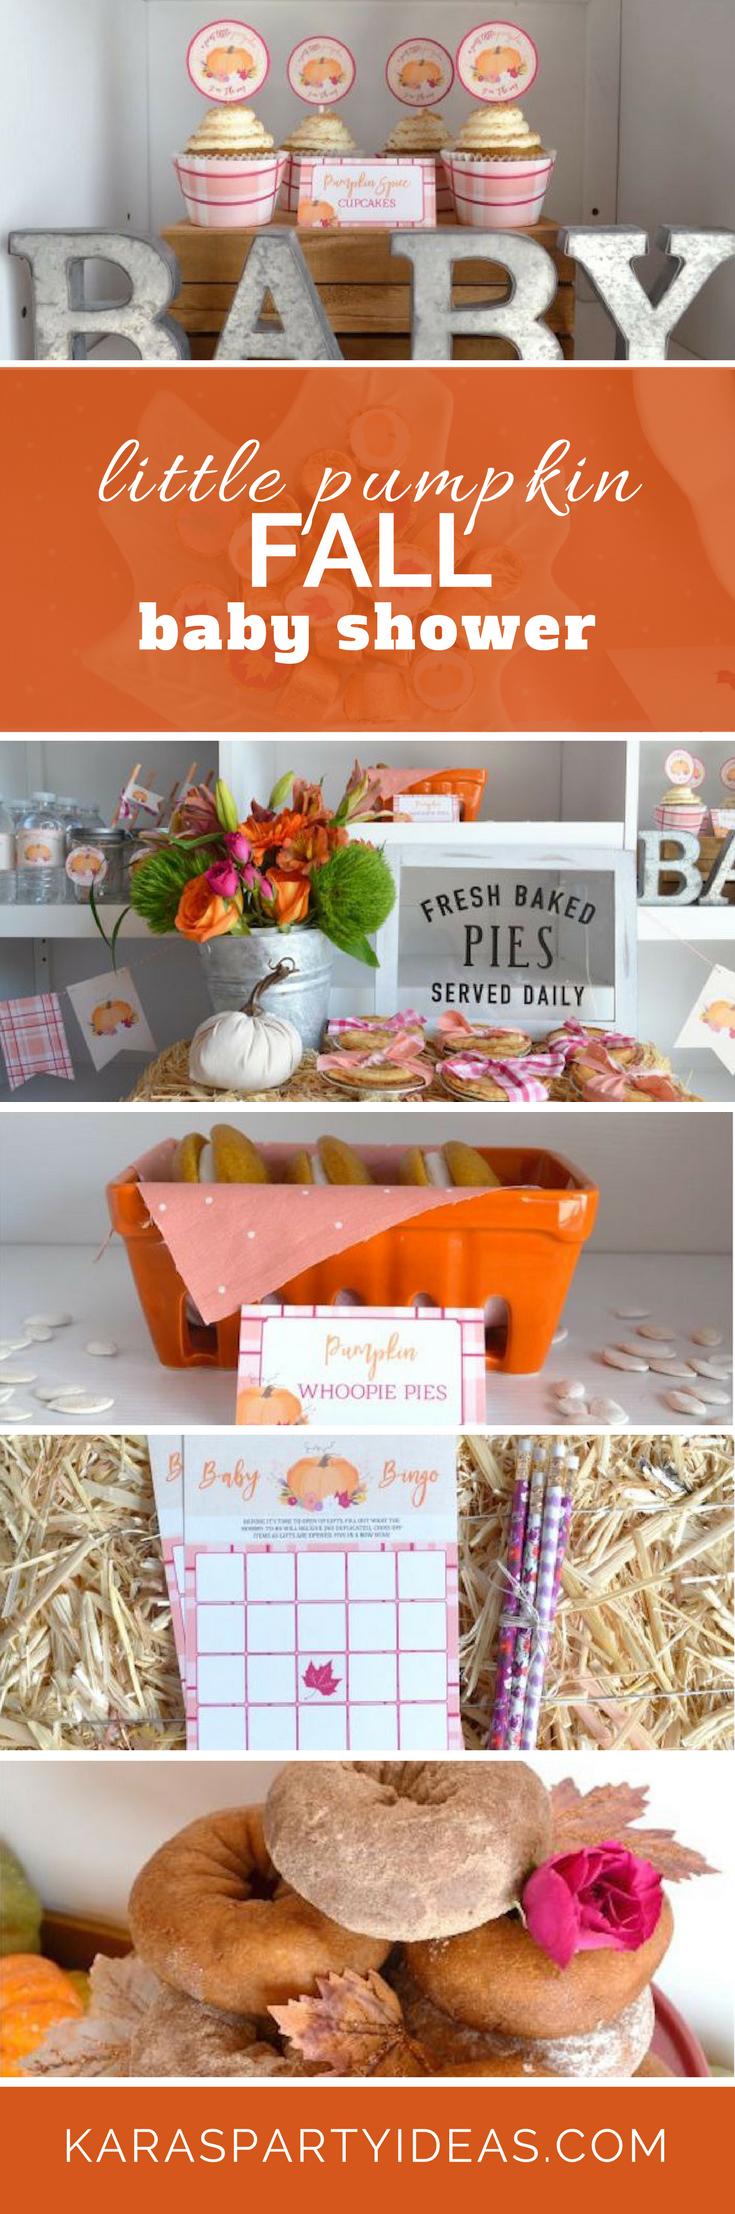 Little Pumpkin Fall Baby Shower via Kara's Party Ideas - KarasPartyIdeas.com